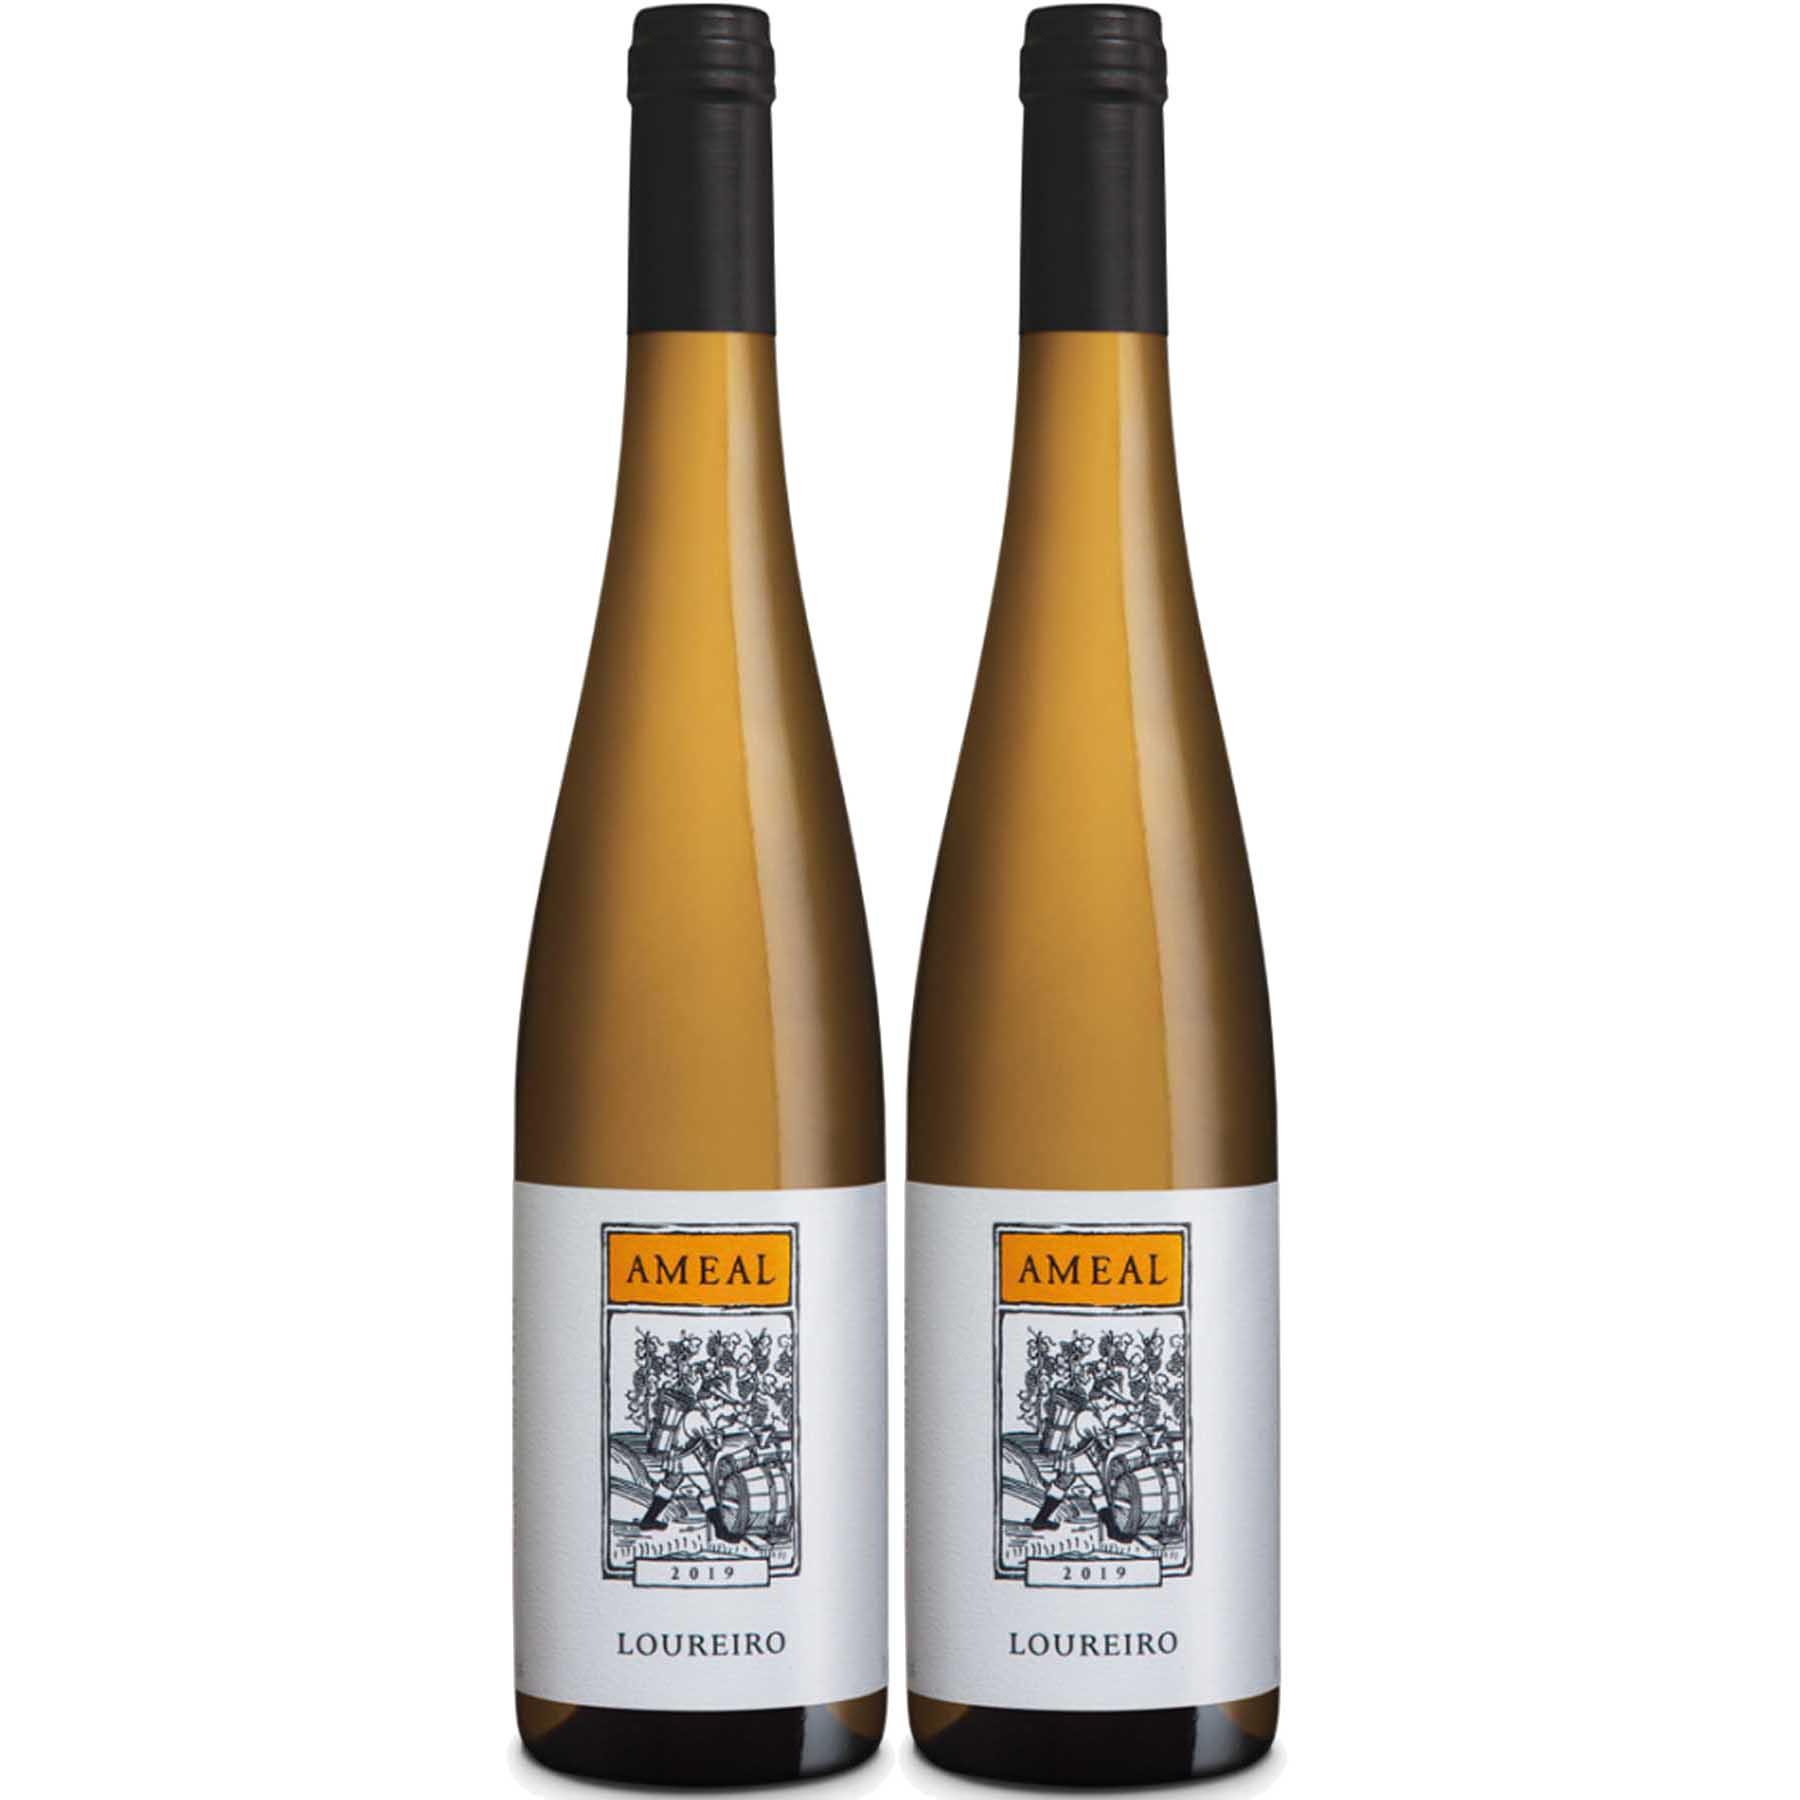 Kit 2 Vinho Branco Português Verde Ameal Loureiro 750ml 2019